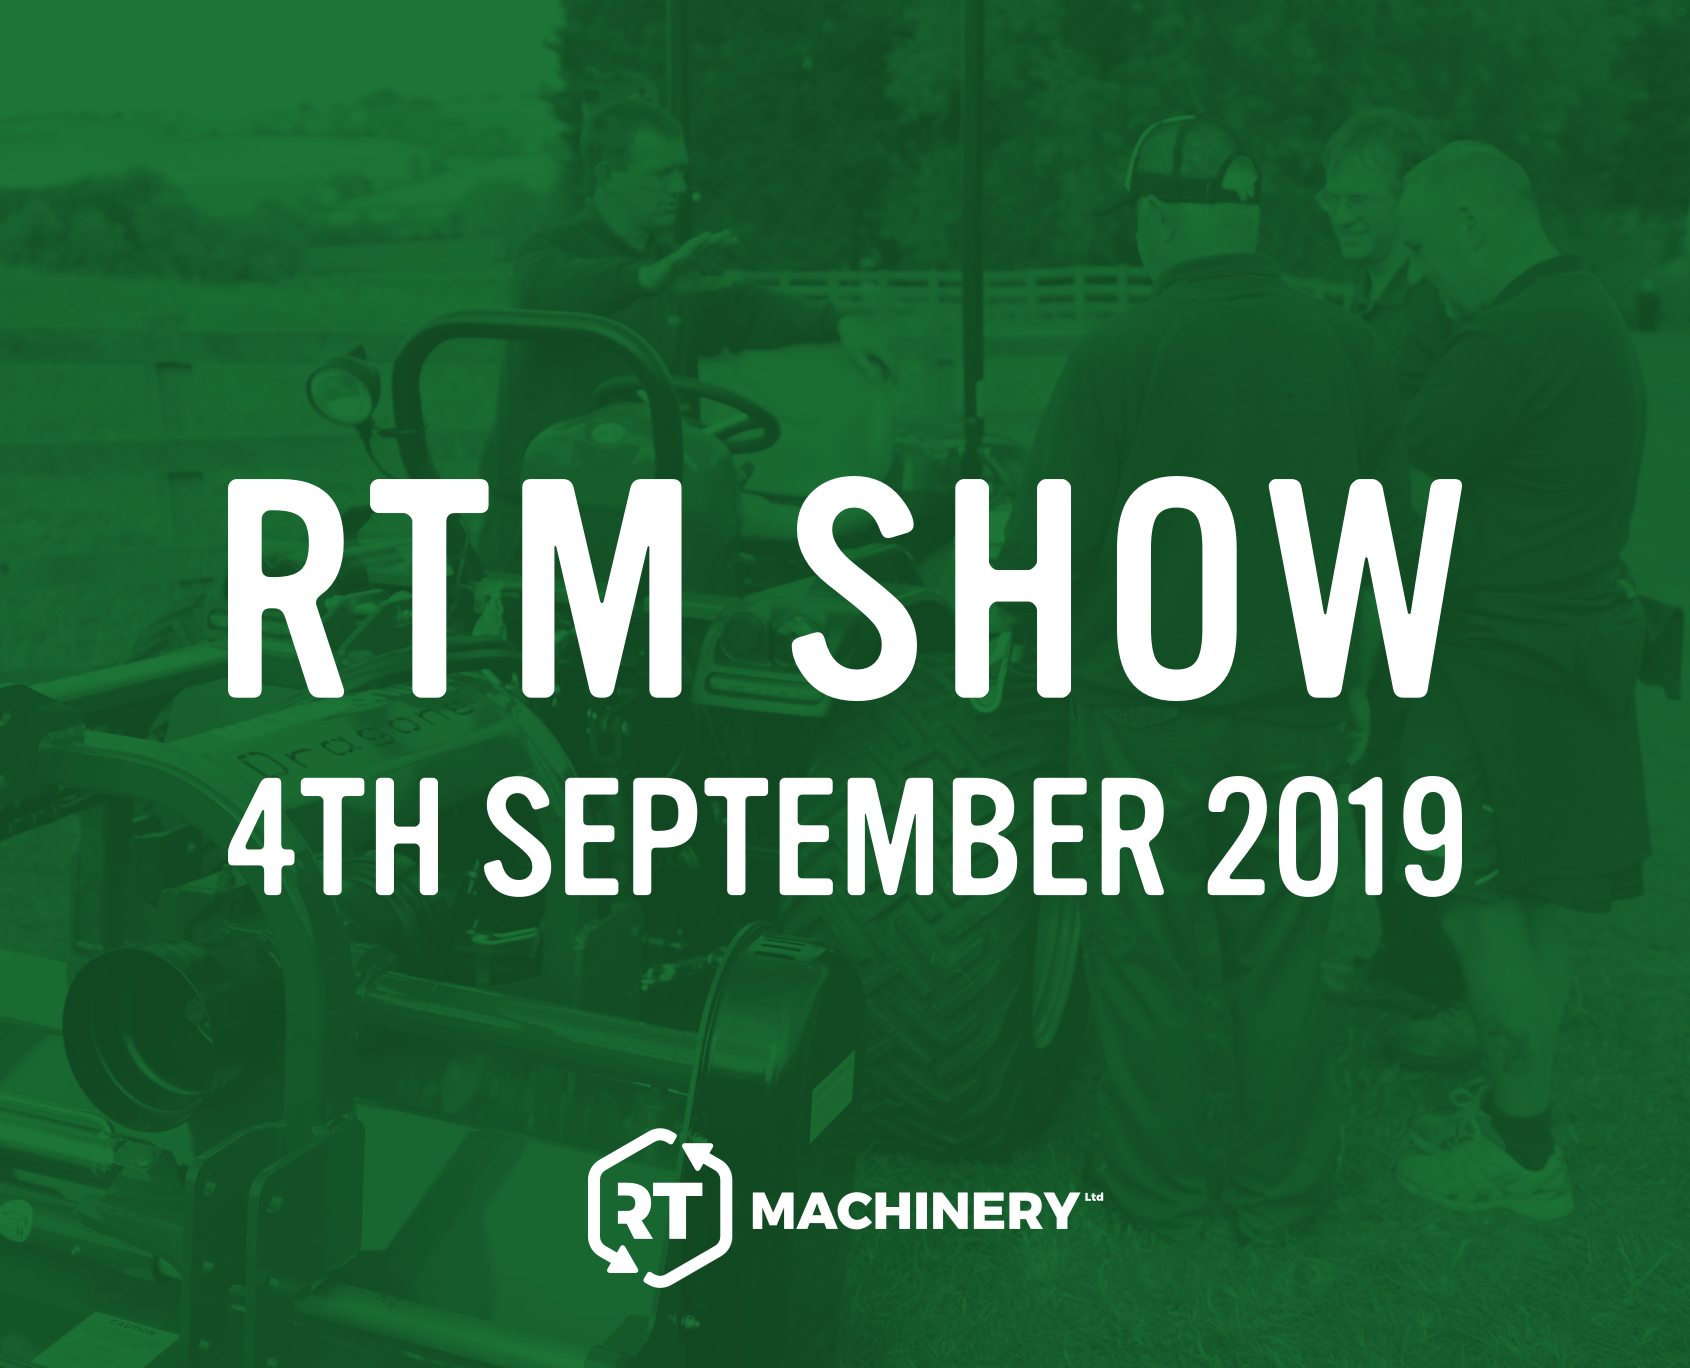 RTM Show 2019